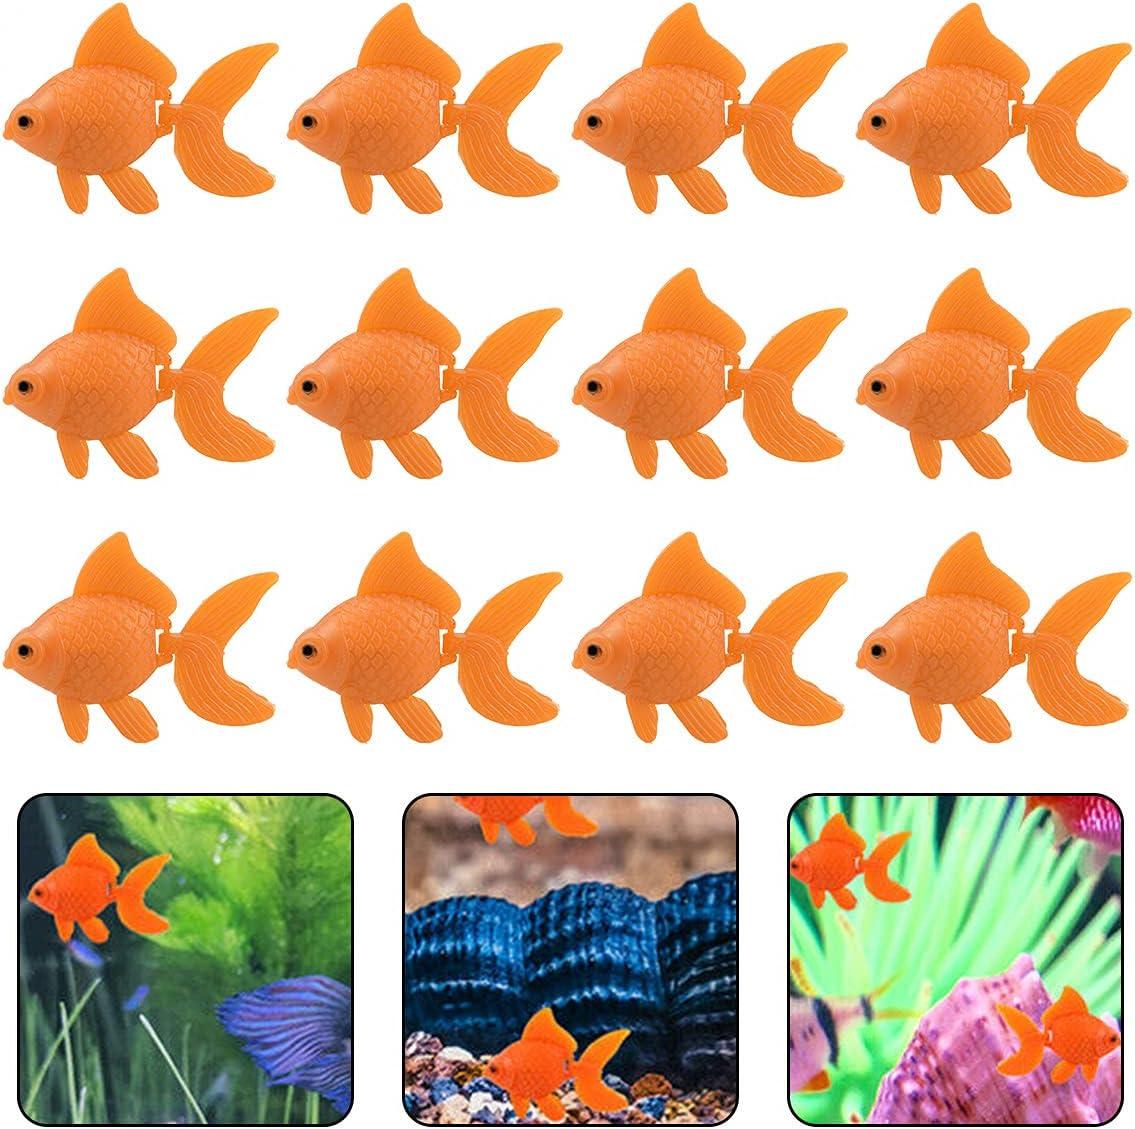 20 Pieces Artificial Goldfish Aquarium Plastic Fish Moving Floating Goldfishes Ornaments Fake Goldfish Decorations for Aquarium Fish Bowl Tank